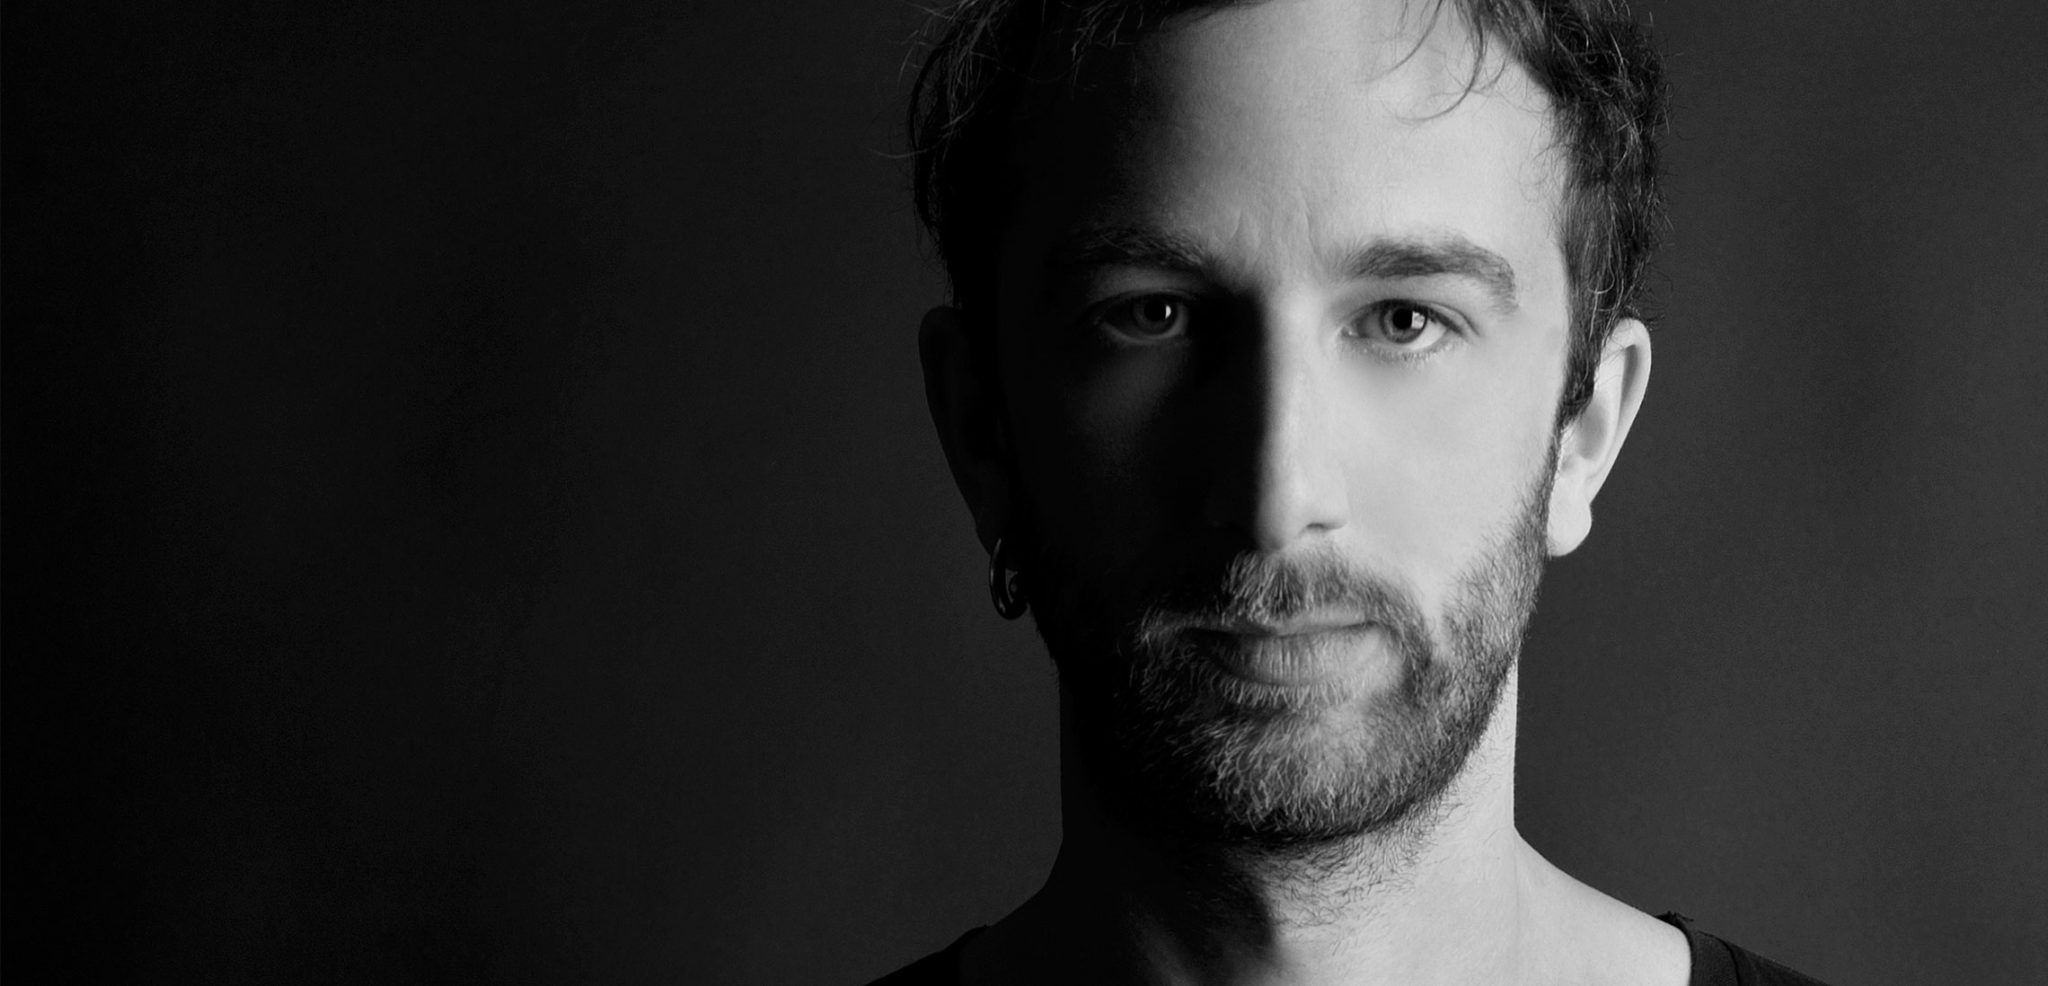 Philip Bader - Keep Ya Head Up EP (incl. Detlef, PAWSA & Kalyde remixes) hero